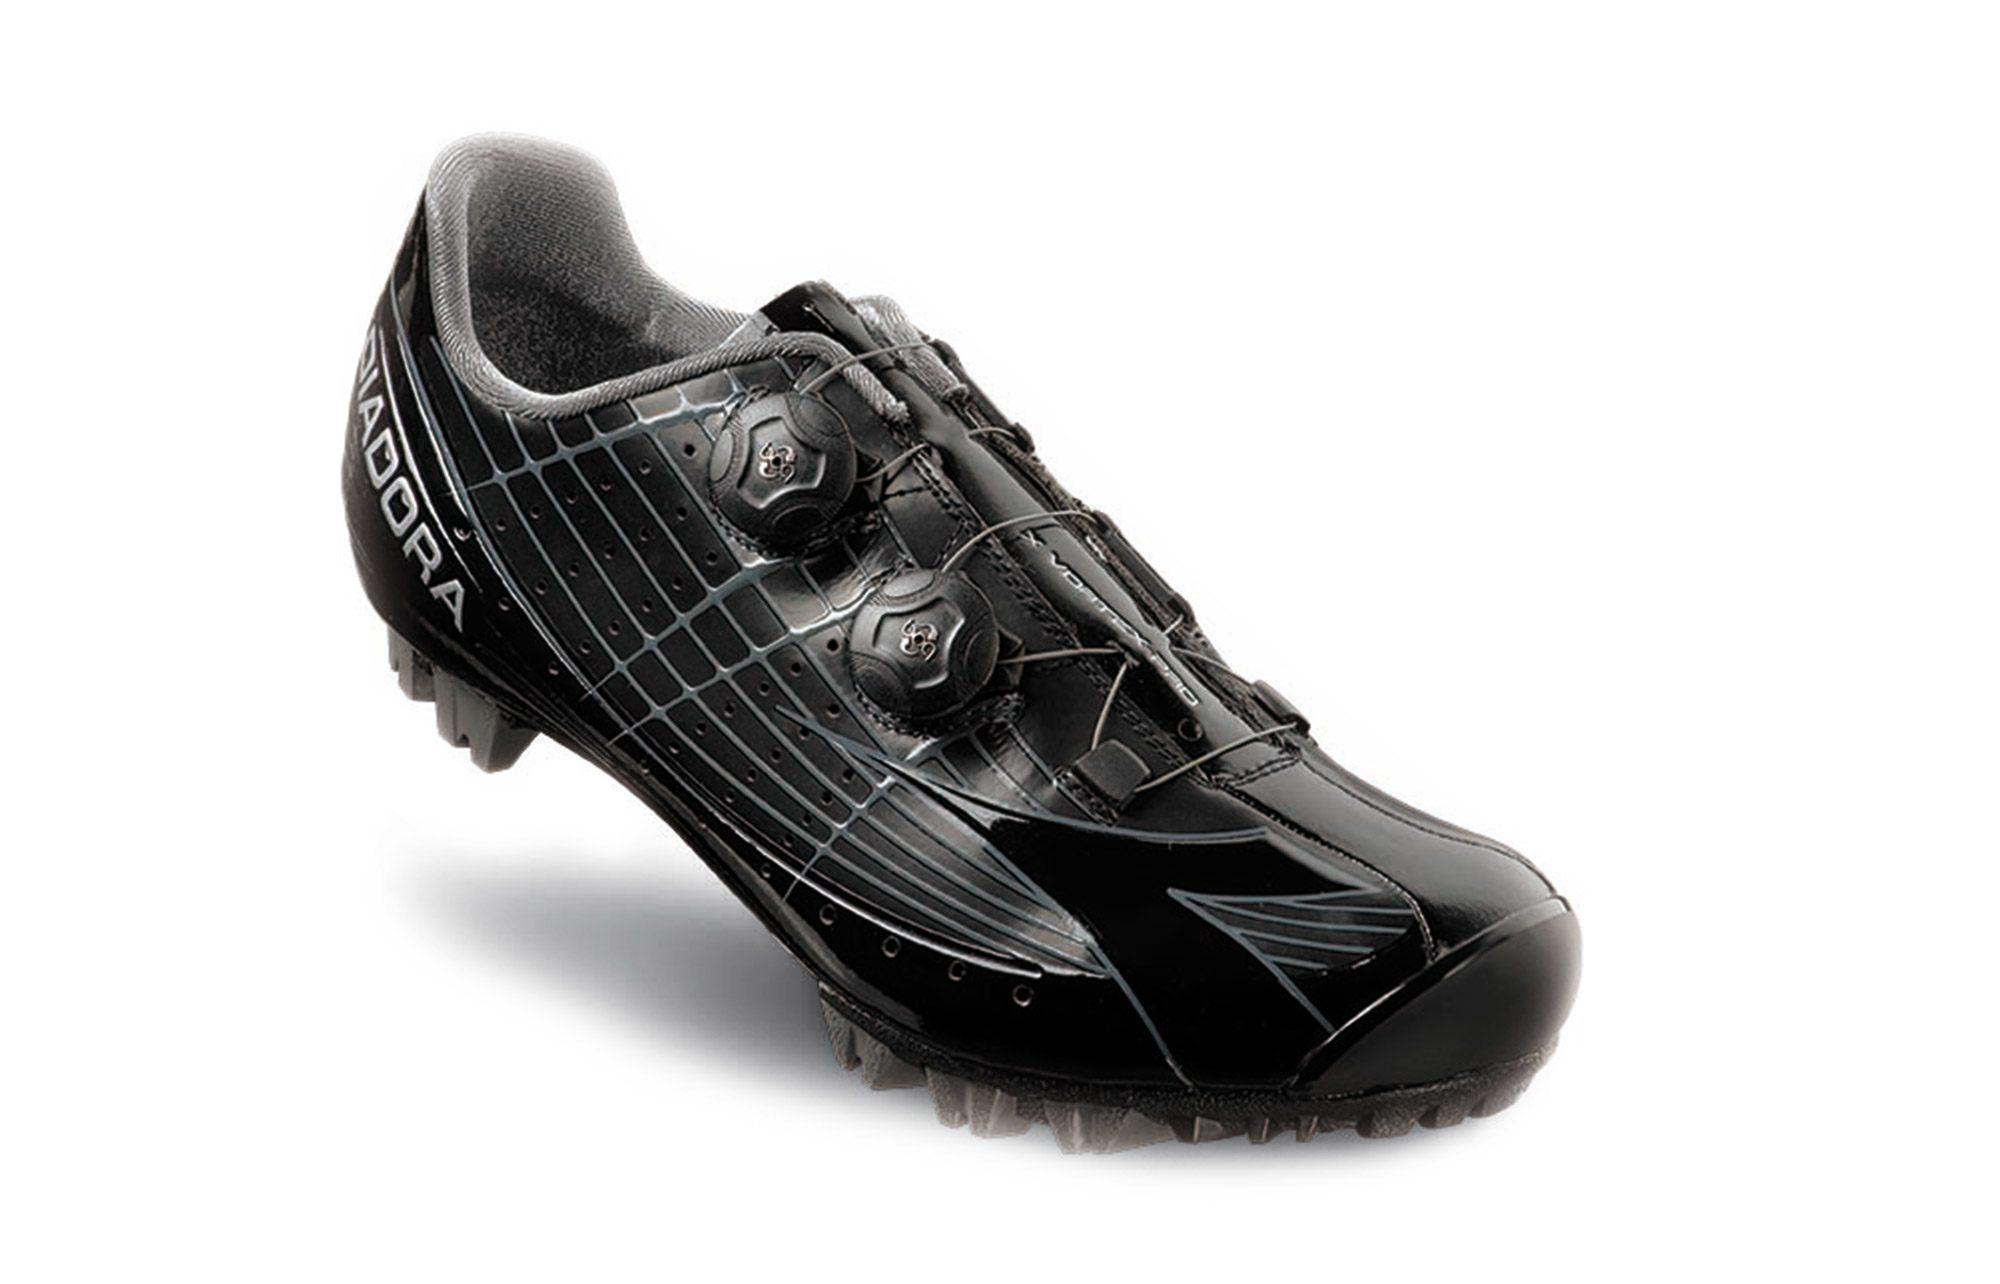 Diadora Pro Cycles amp;a X Vortex Shoes R rv8rUq1